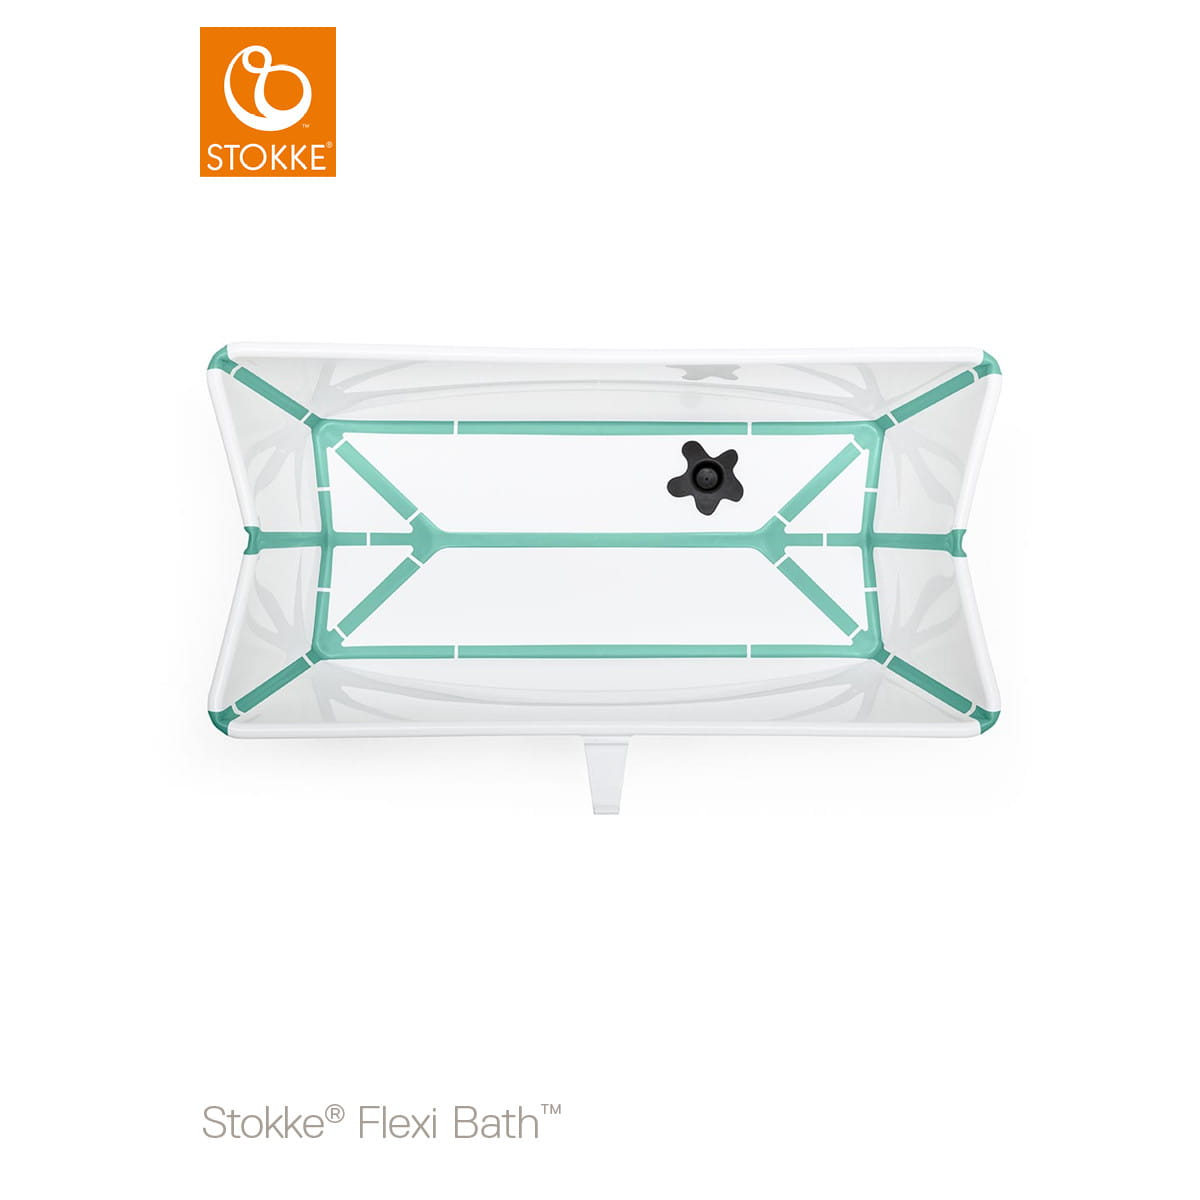 Foldable baby bath tub STOKKE FLEXI BATH white aqua Nordic ...